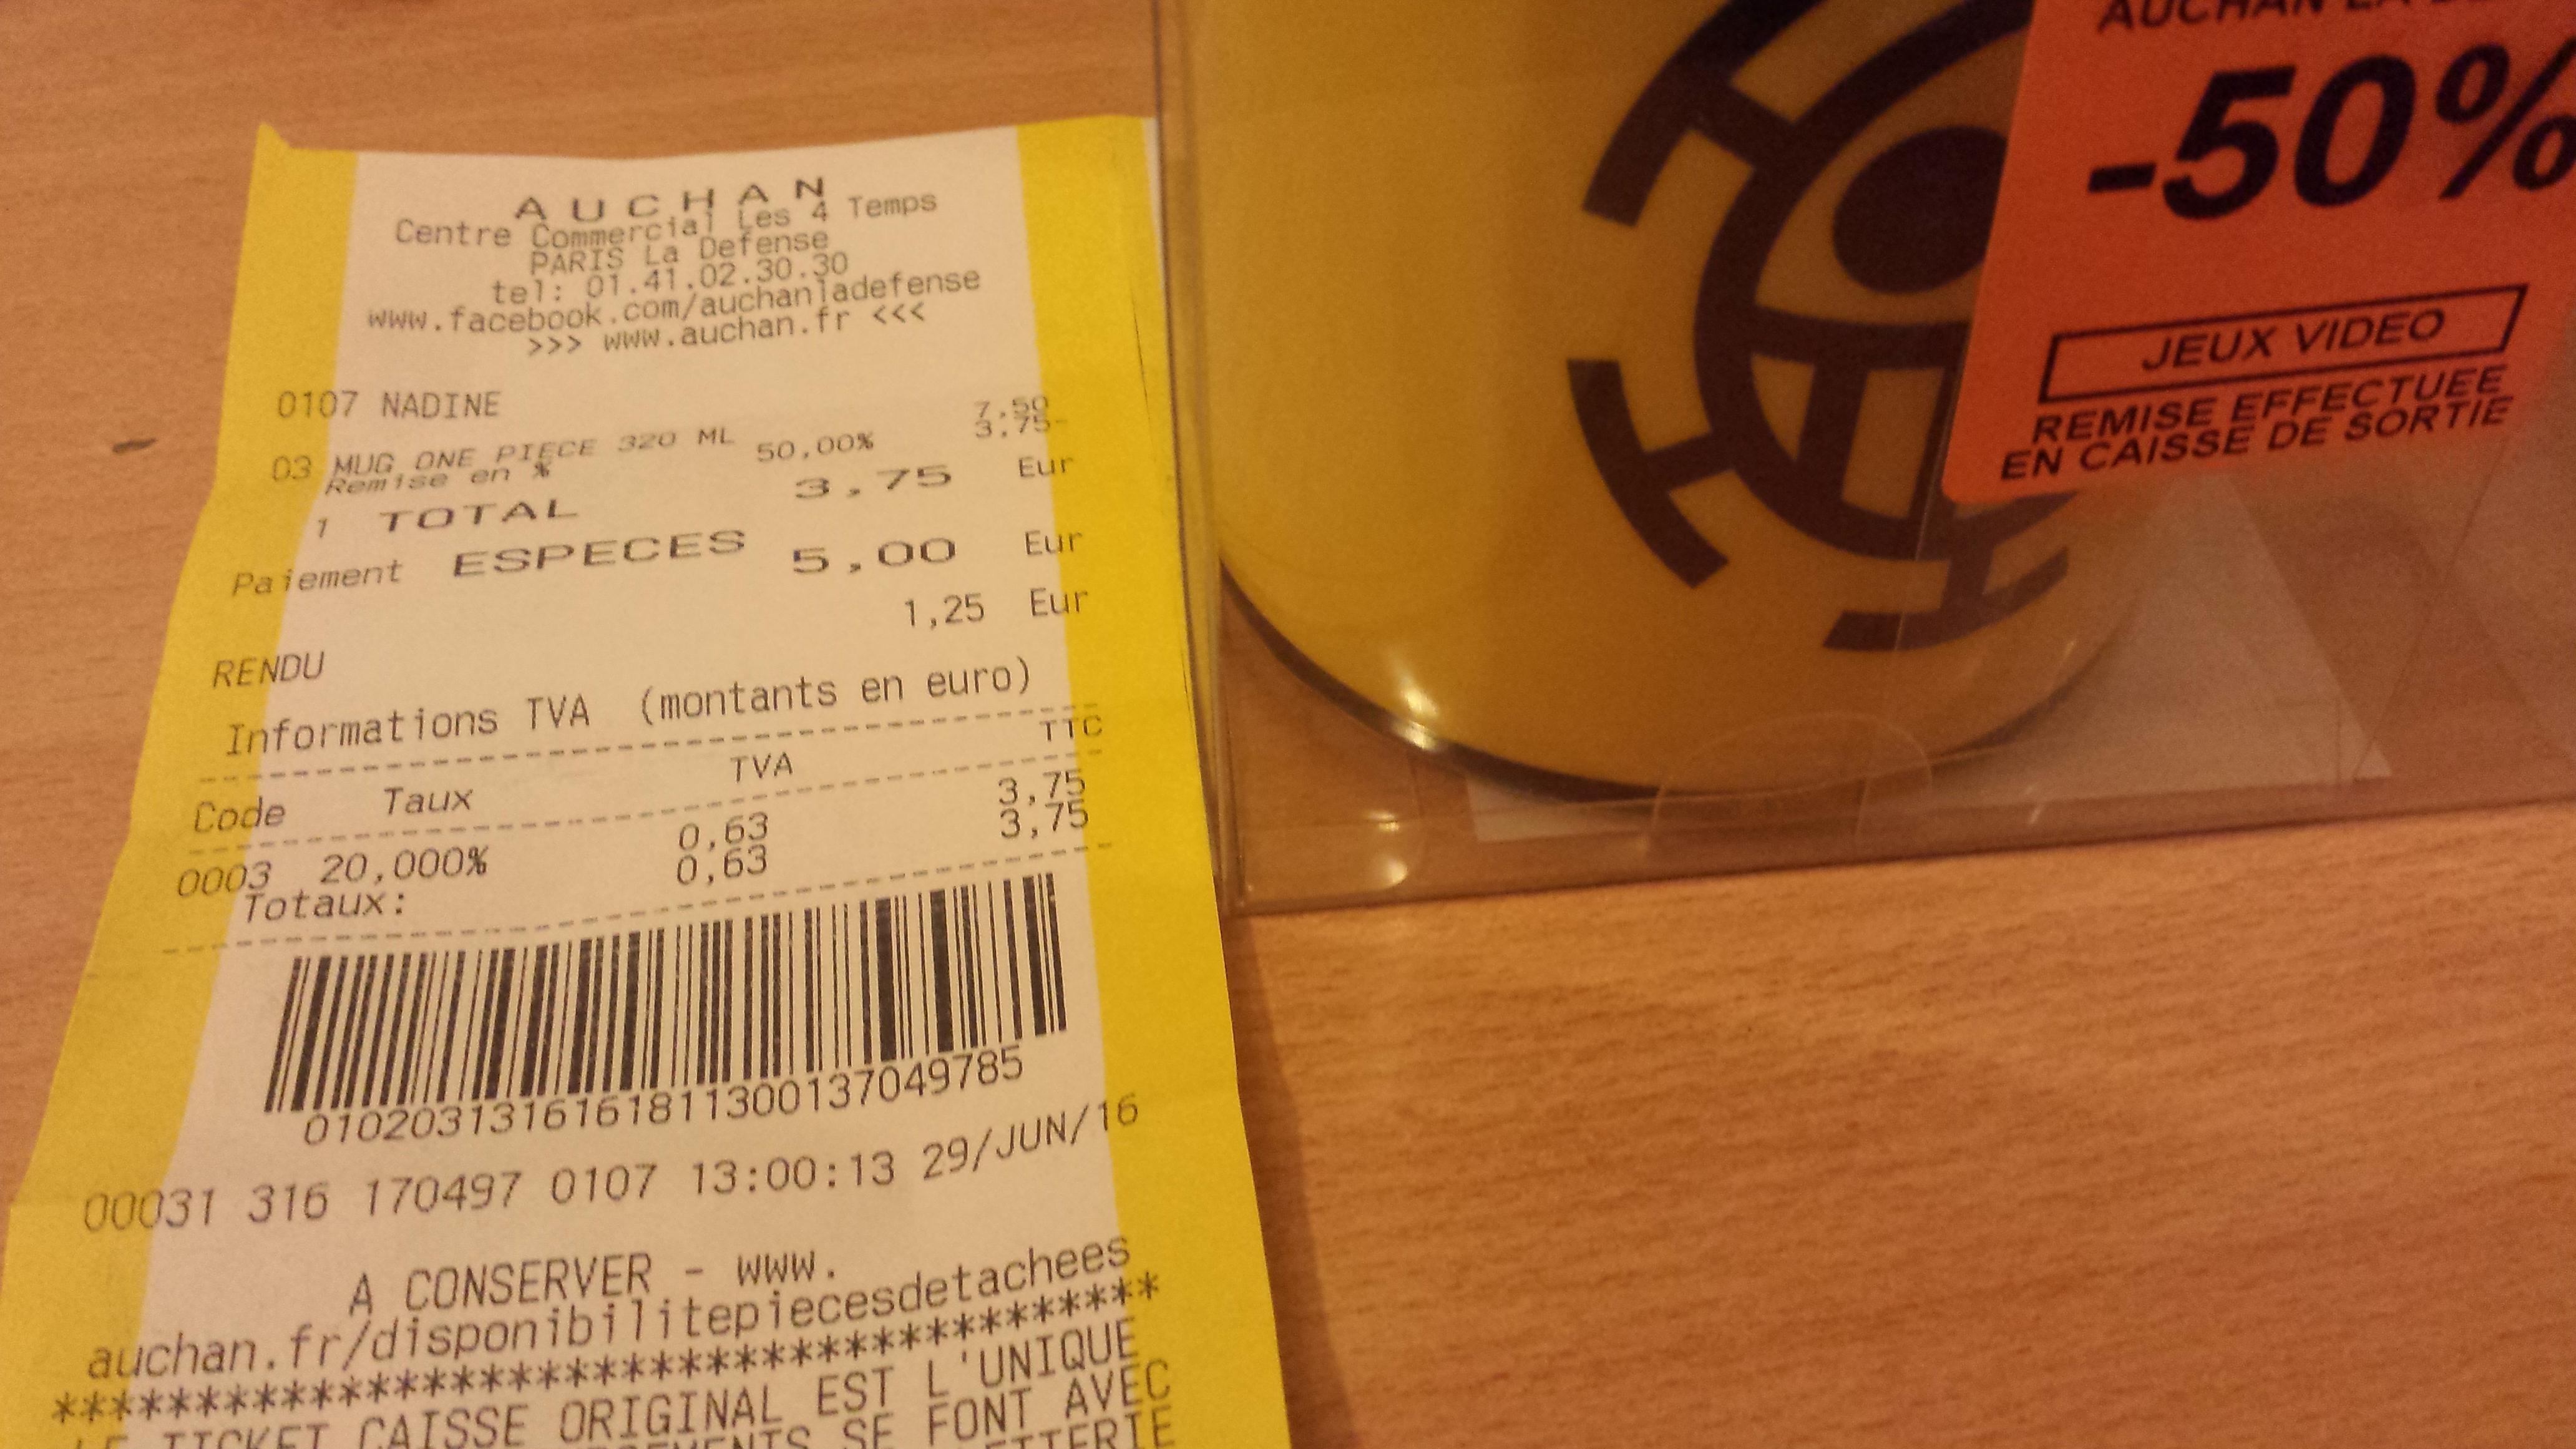 Sélection de mug One Piece en promotion - Ex : Mug One Piece - 320 ml